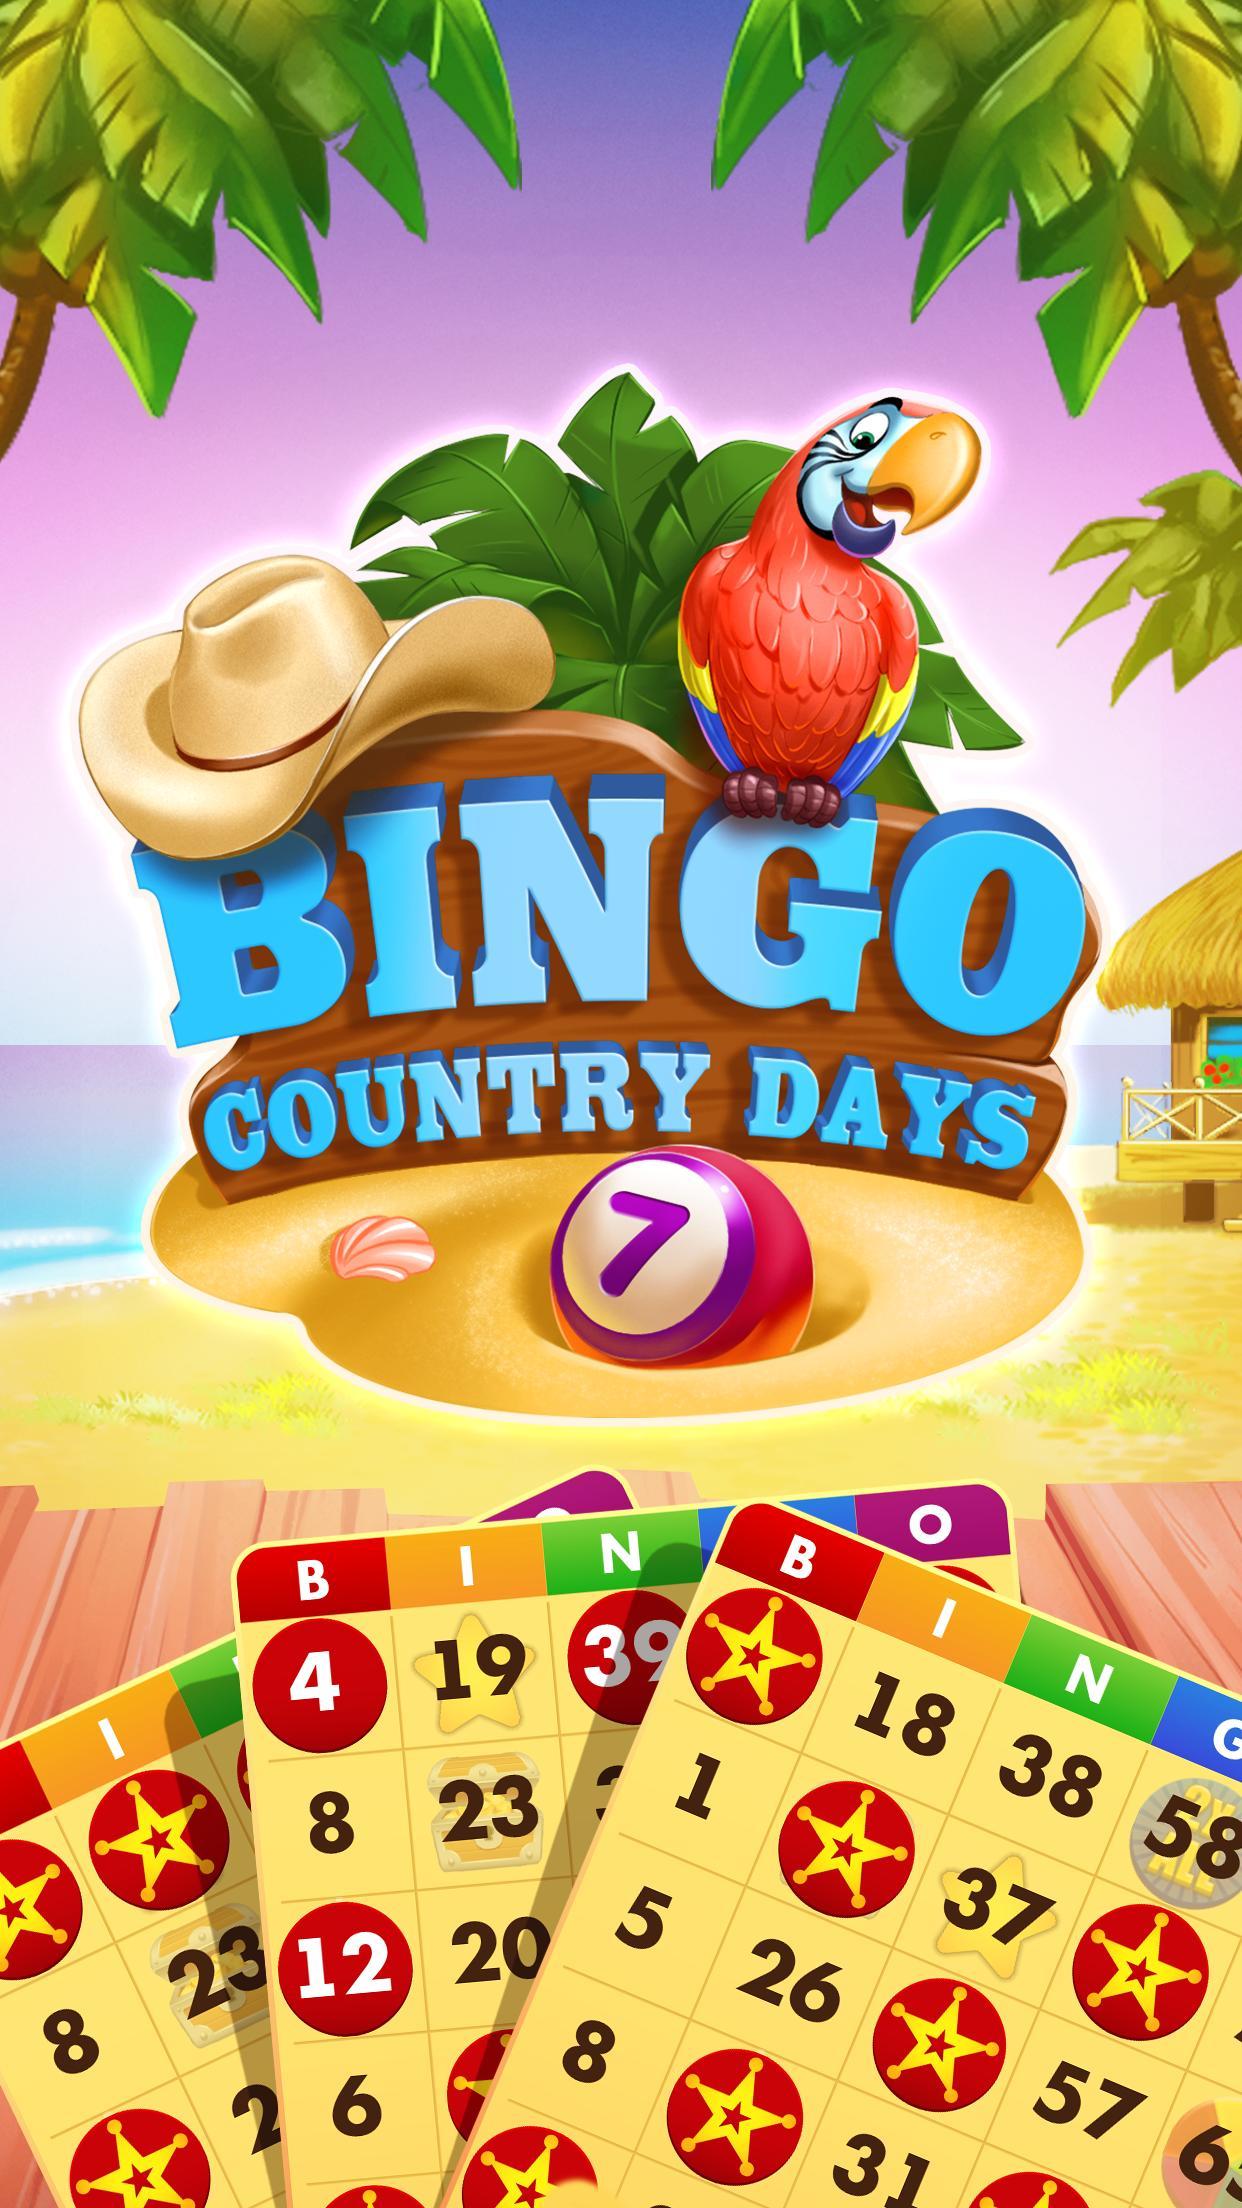 Bingo Country Days Best Free Bingo Games 1.0.610 Screenshot 5